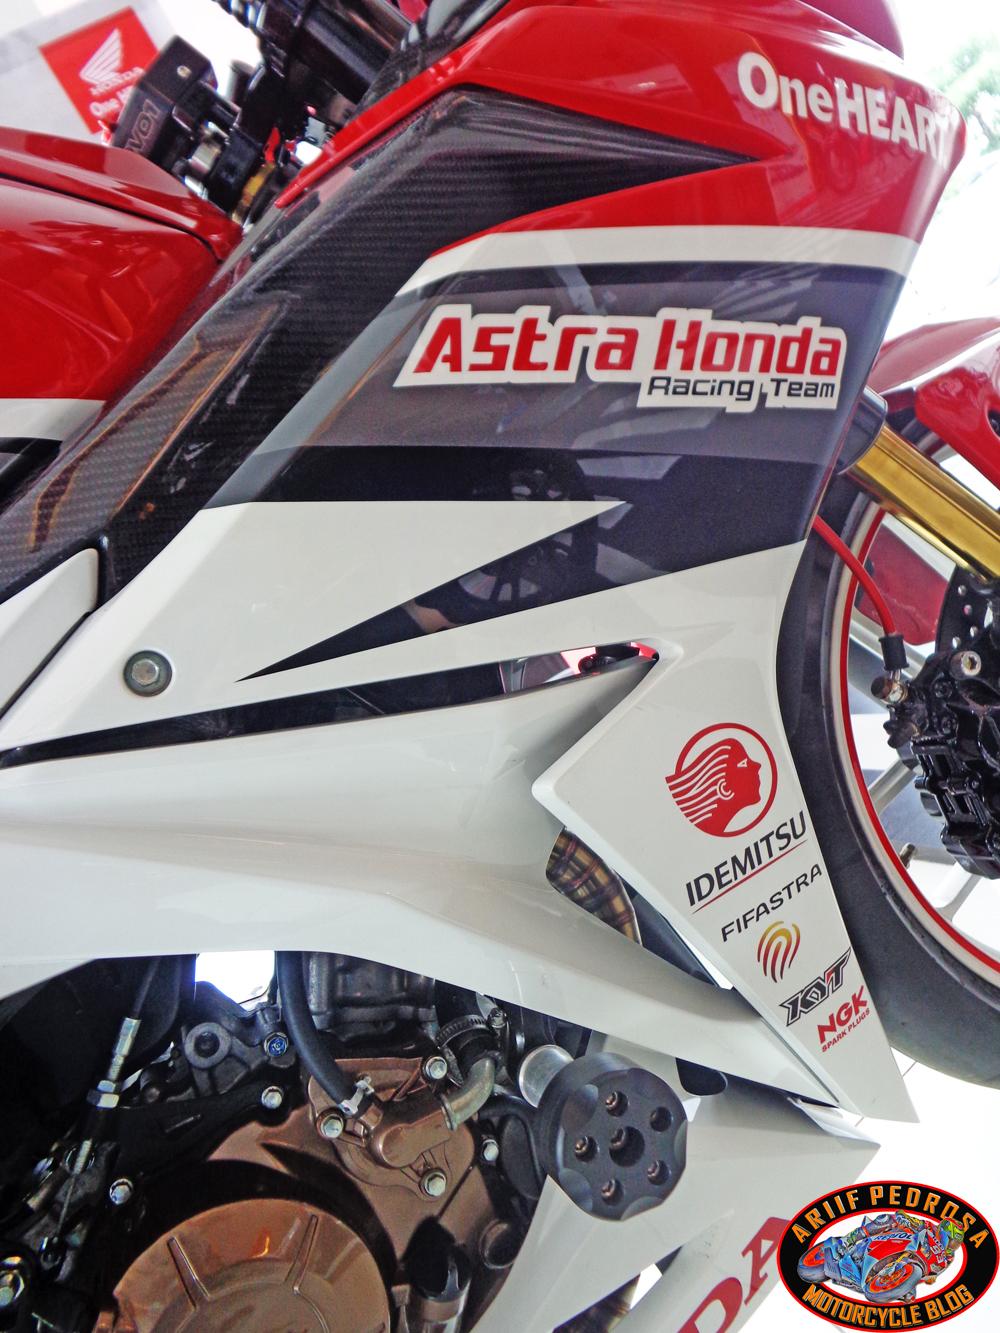 Intip Sangarnya Modifikasi All New Honda Cbr 150r 2016 By Astra Frame Slider 150 R Pemilik Blog Iniih Eksis Lagi Omm V